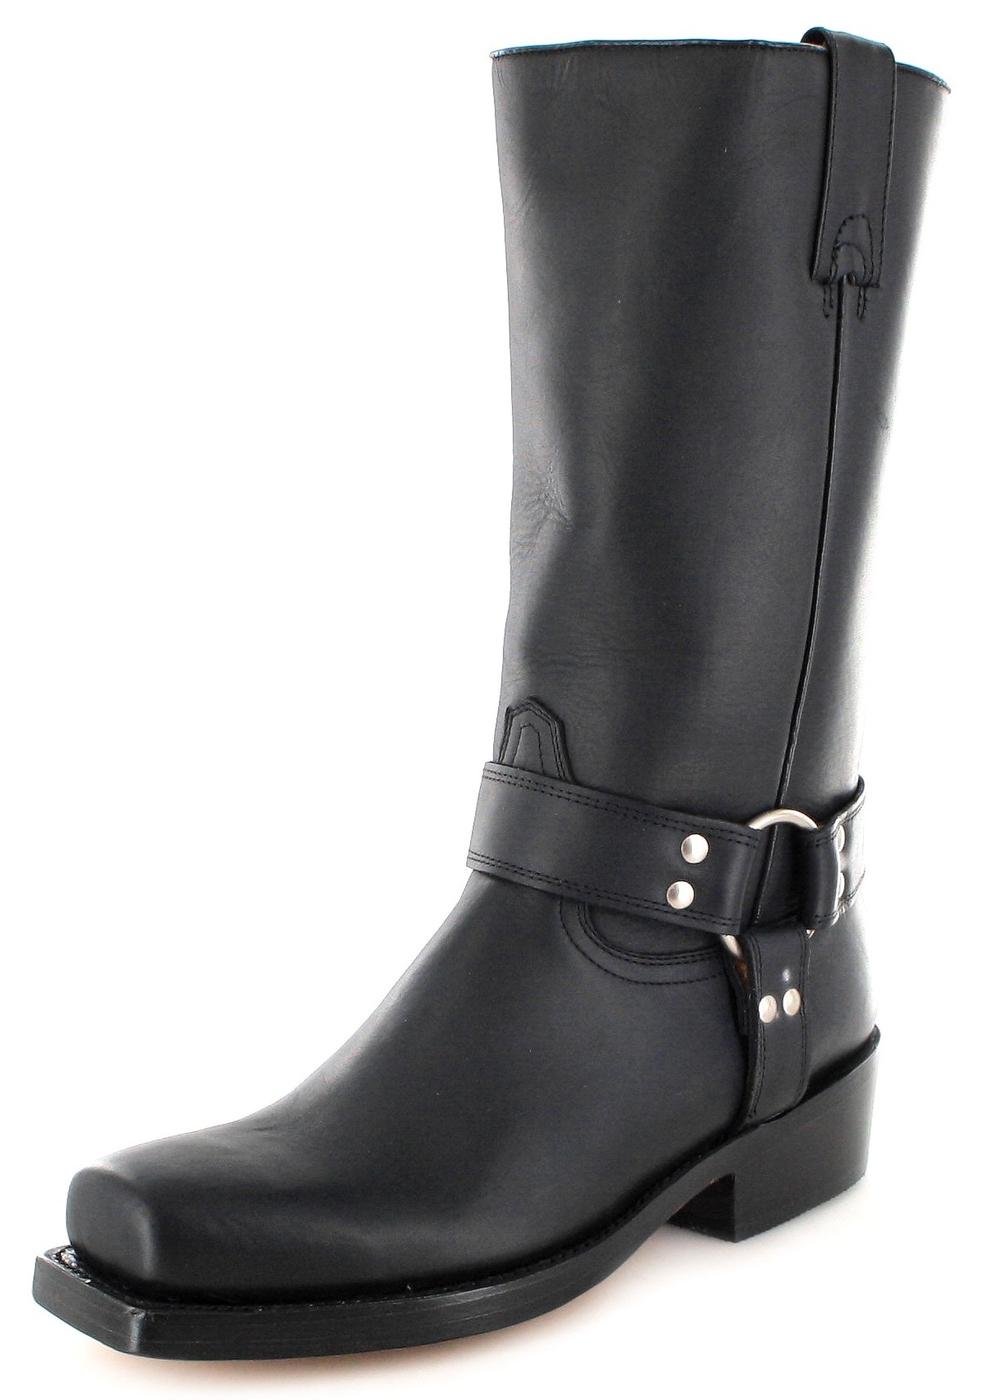 Buffalo Boots 1801 Bikerstiefel - schwarz